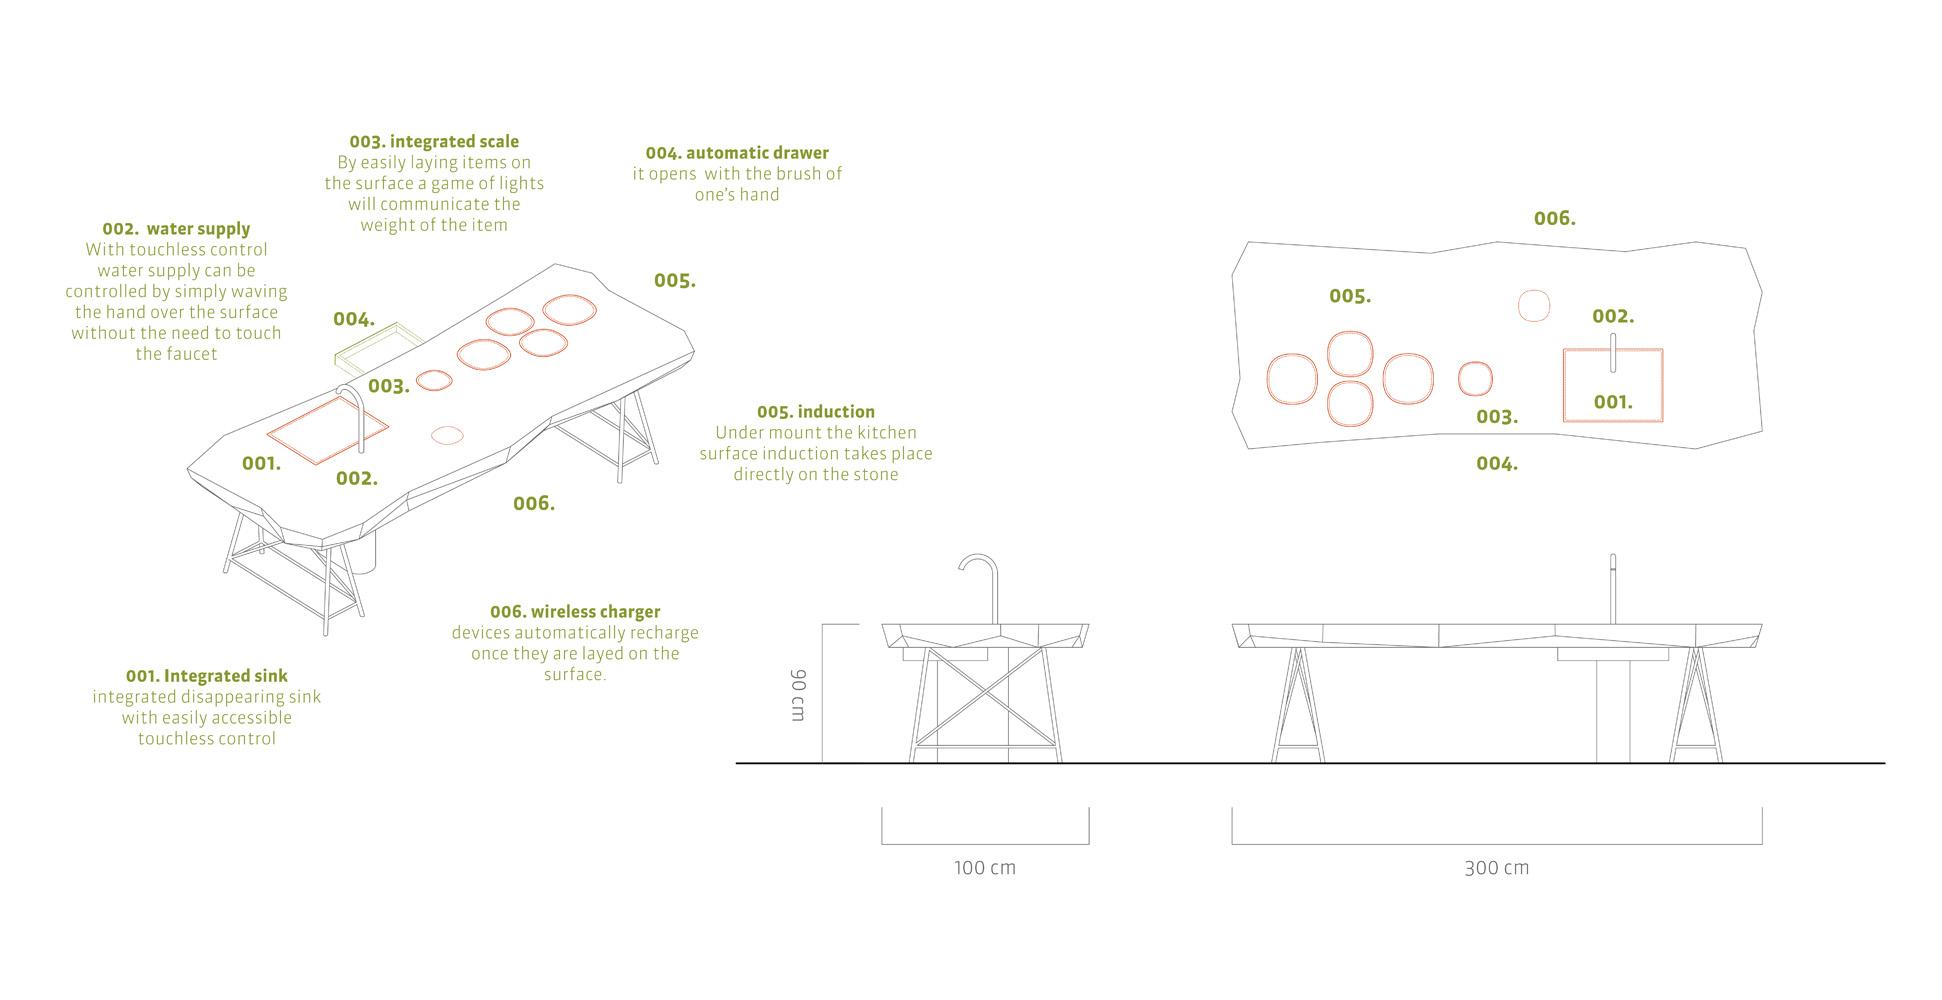 tipic_offmat_tuler_responsive-kitchen_diagram_eng